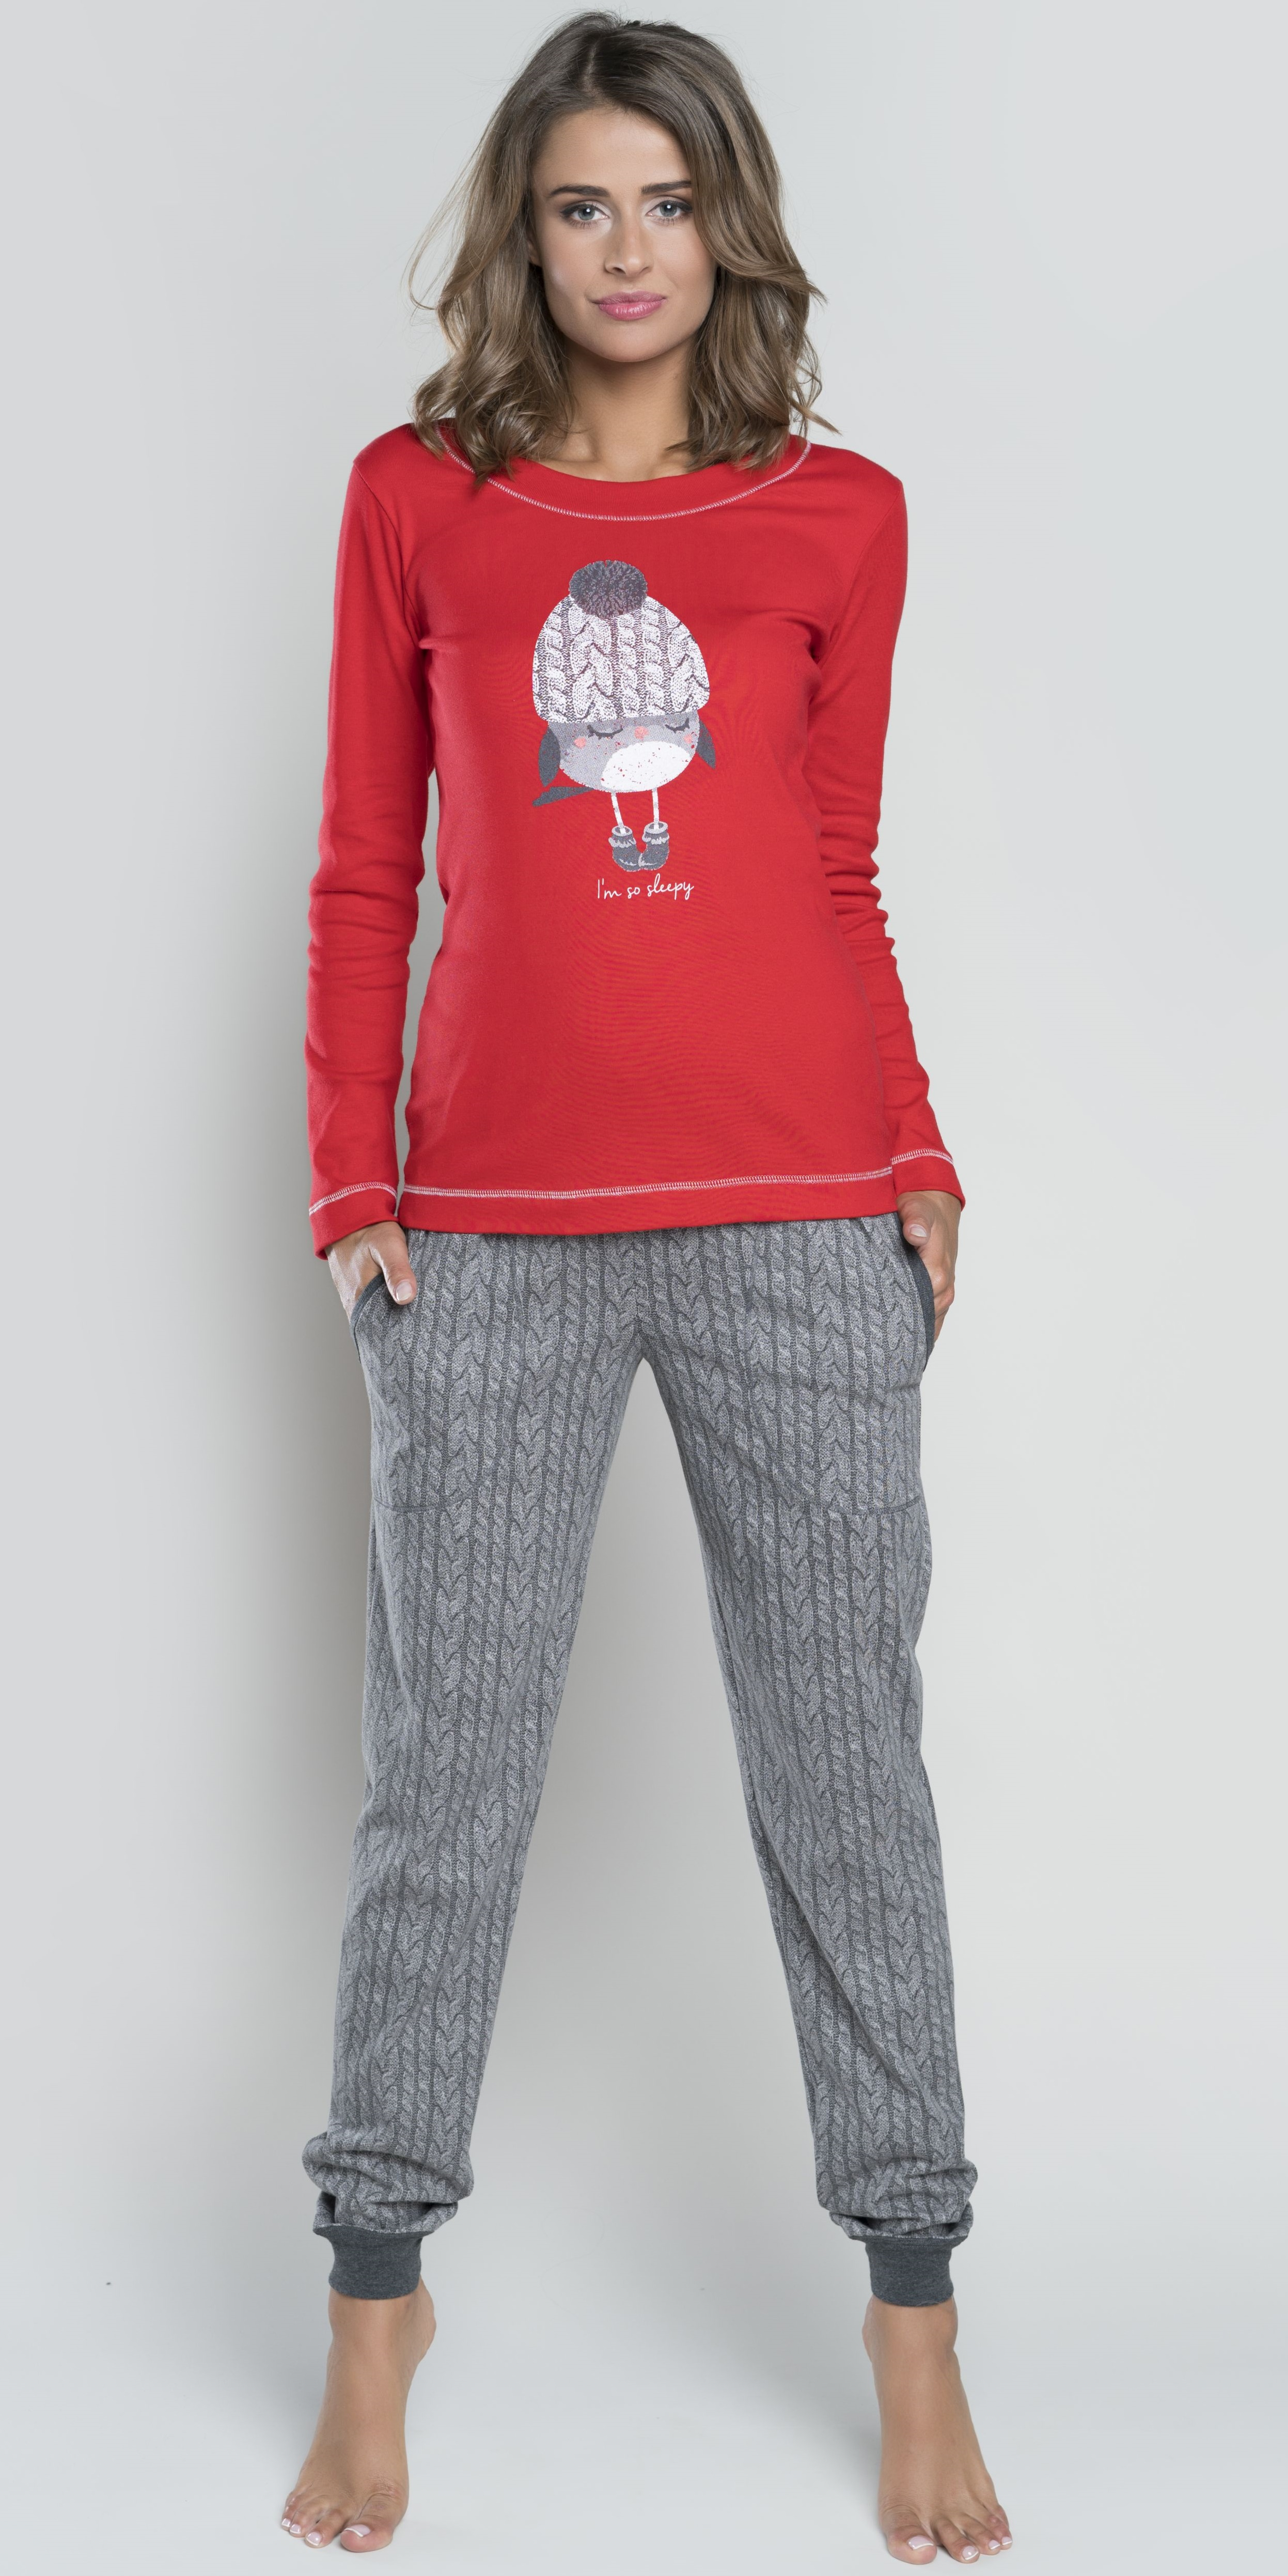 6ddabbf96ec733 Piżama damska TOKIO Italian Fashion - E-lady.pl